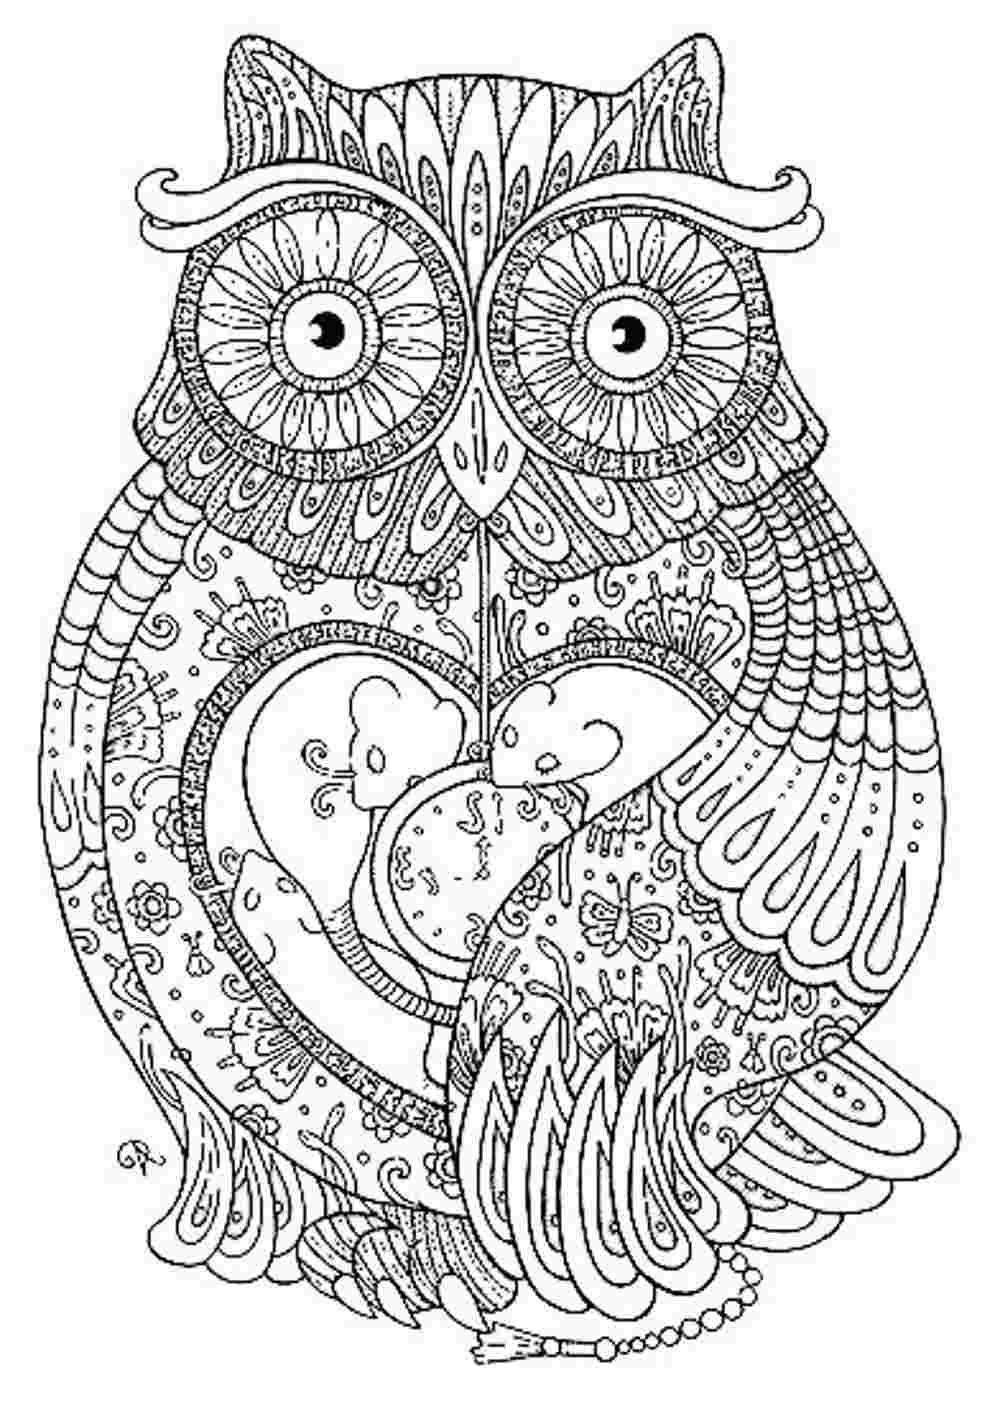 Animal Mandala Coloring Pages To Download And Print For Free - Mandala Coloring Free Printable